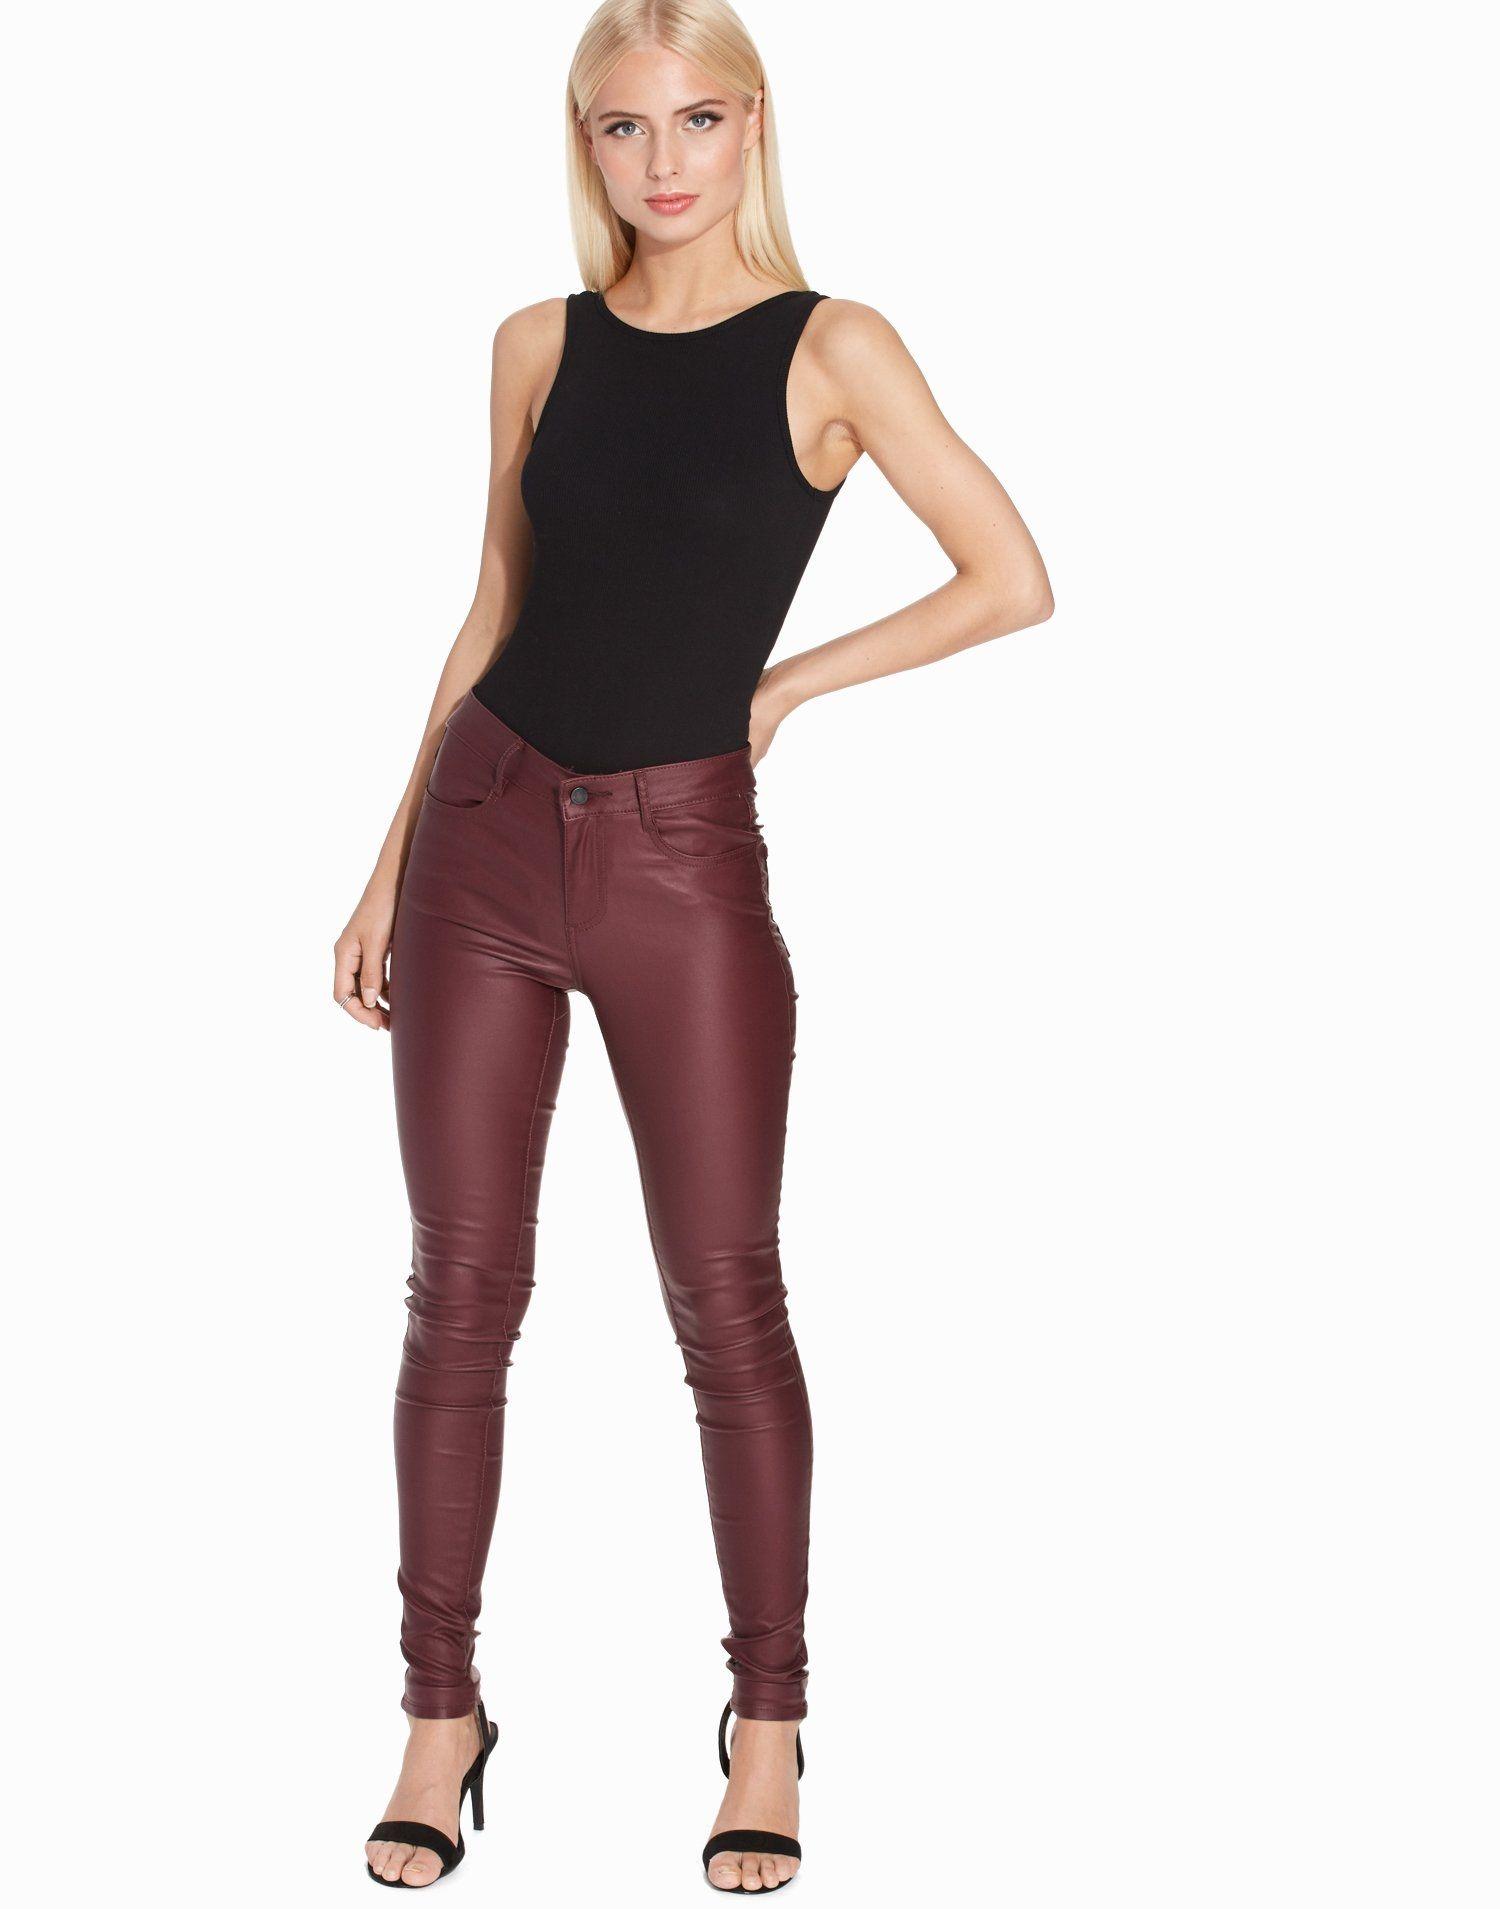 916043b1263 Ribbed Sleeveless Bodysuit - New Look - Black - Tops - Clothing - Women -  Nelly.com Uk